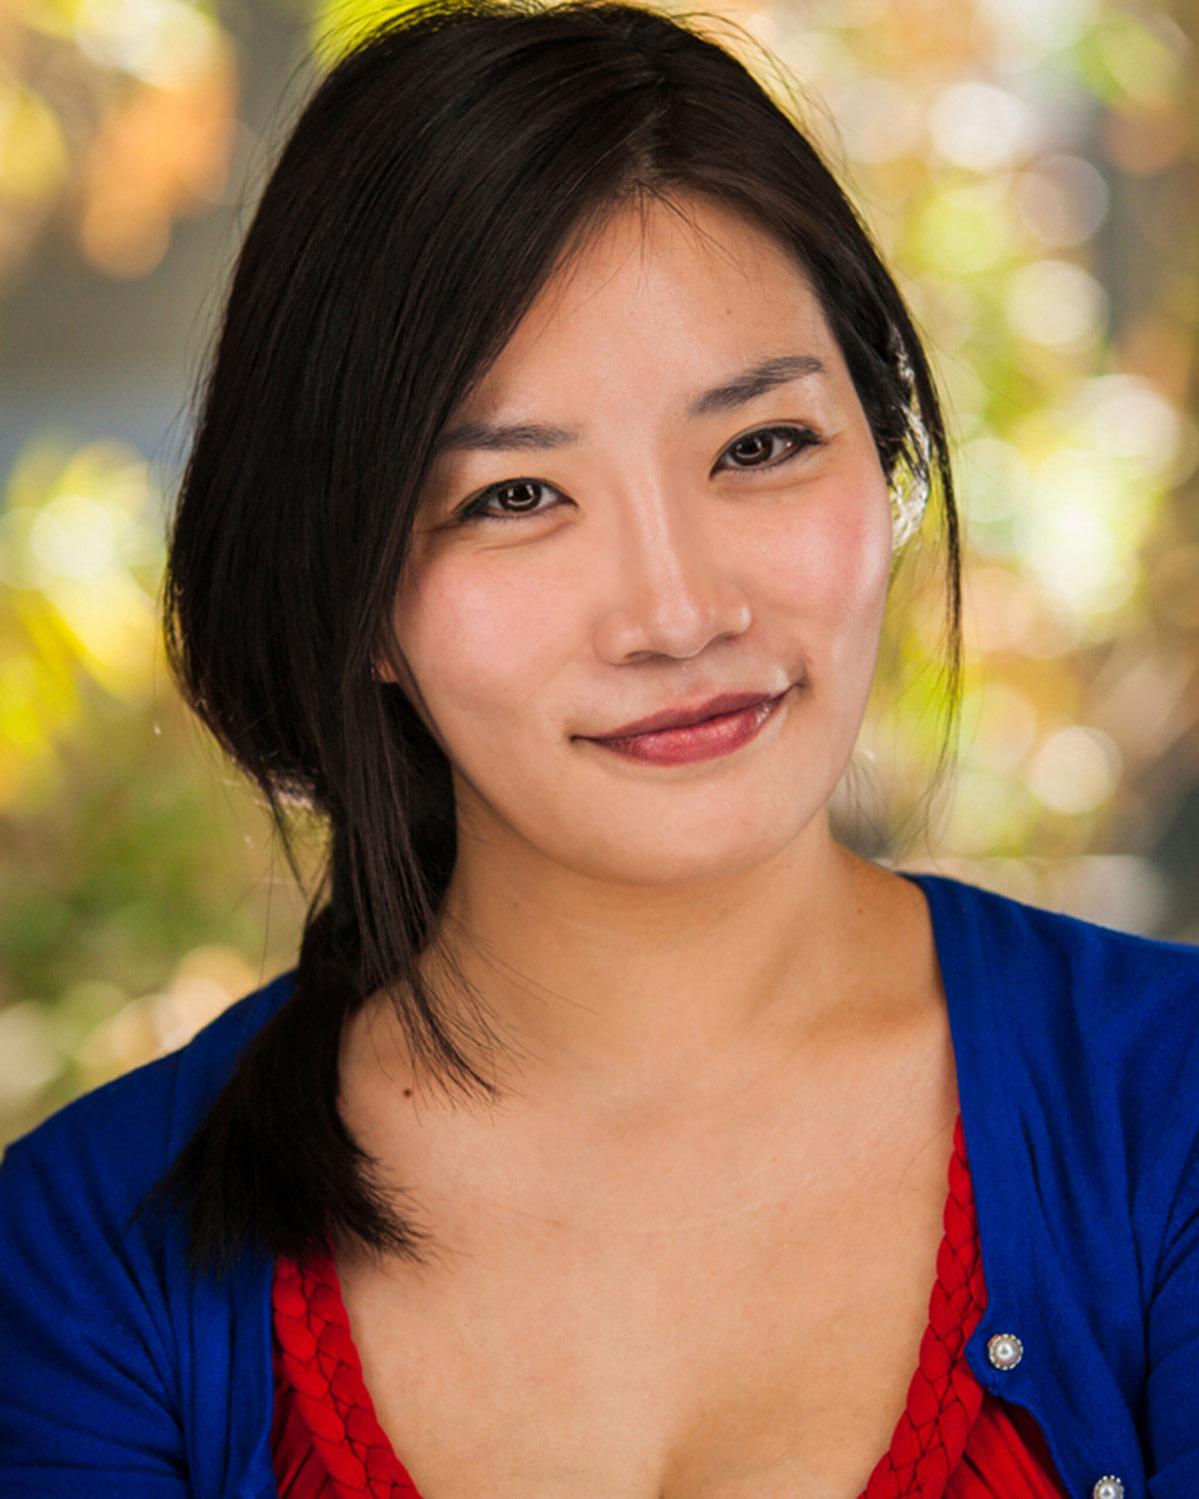 Vivian Ahn Vivian Ahn 249 of 289 scaled